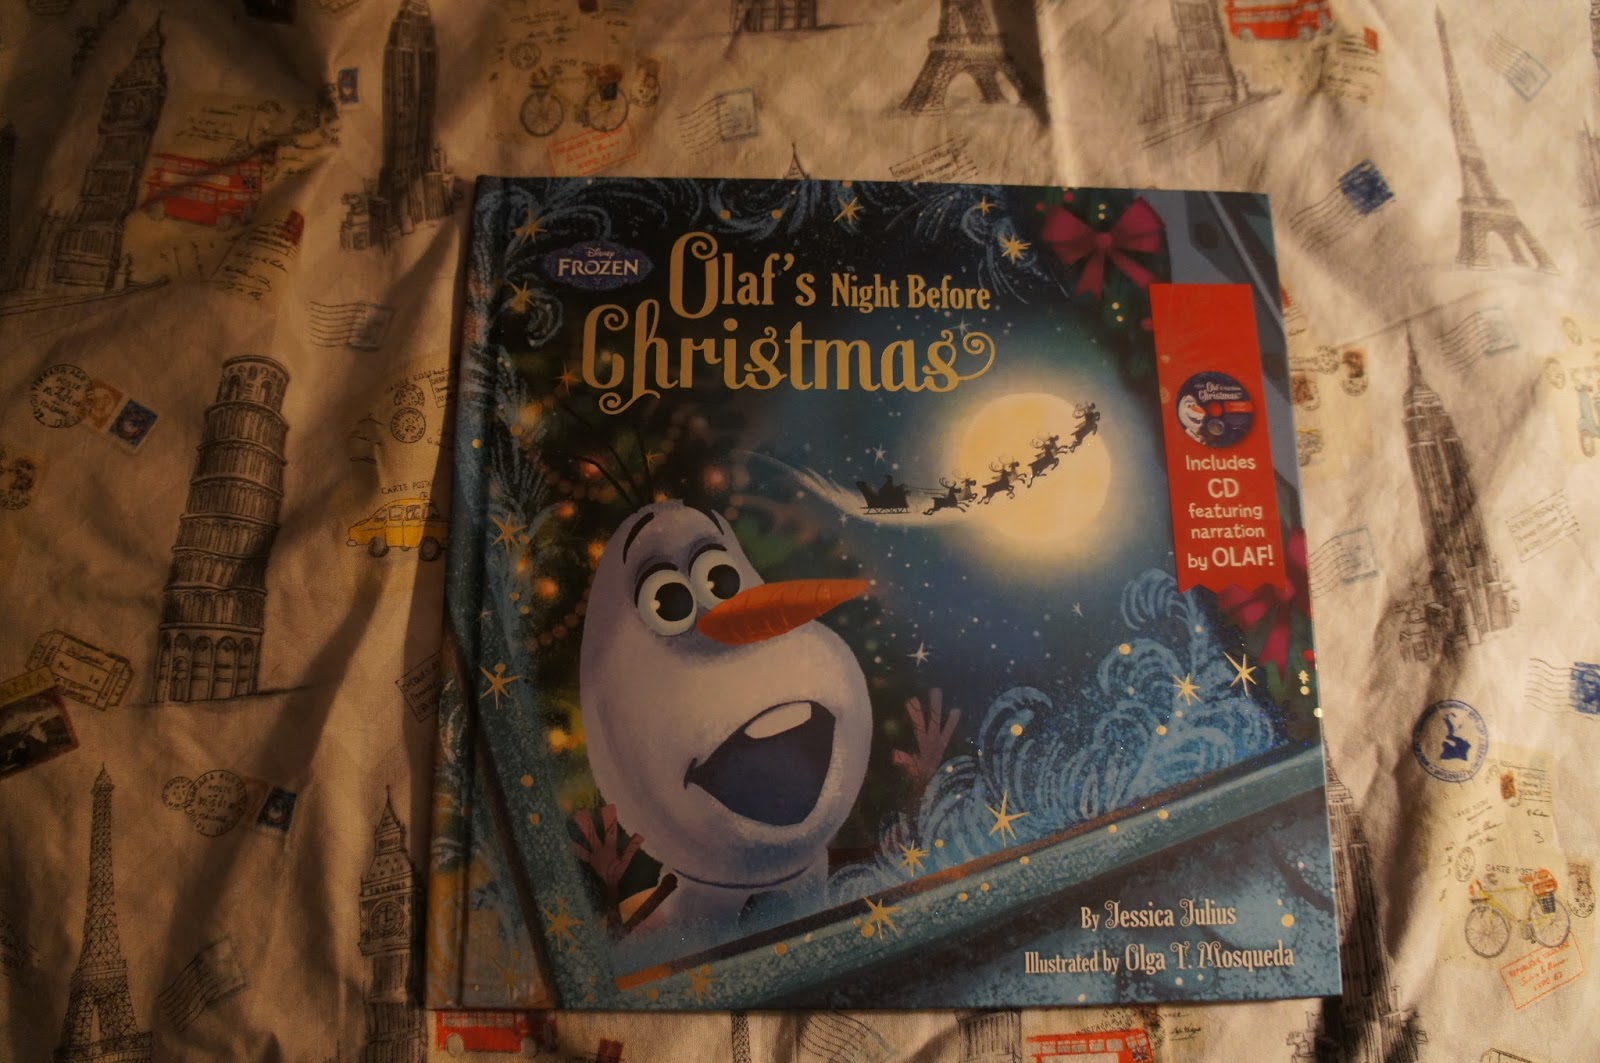 Picturing Disney: Disney Publishing Winter Fun Guide!